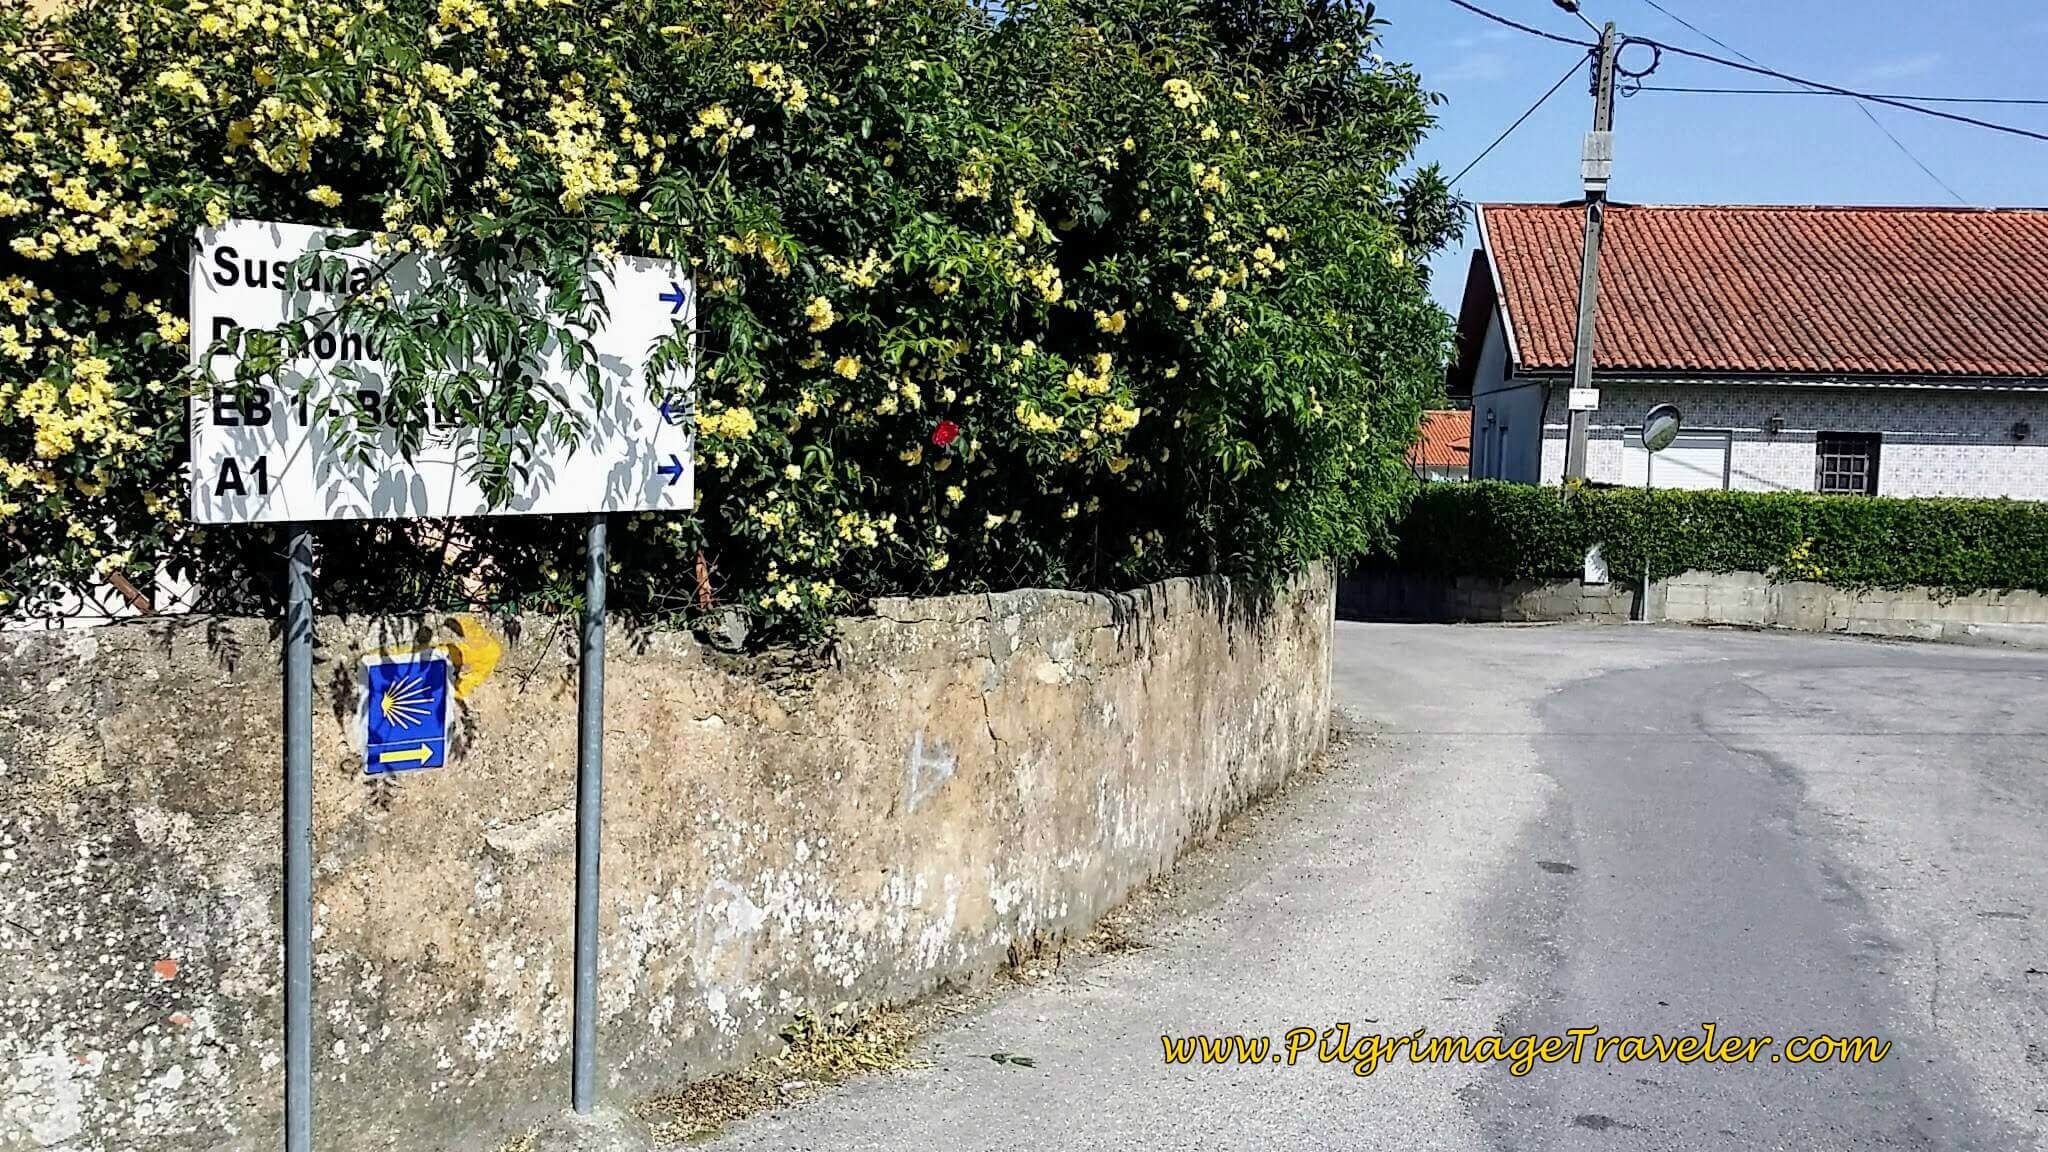 A Right Turn Here off the Rua de Besteiros To Rua de Estrada Real on day thirteen of the Camino Portugués